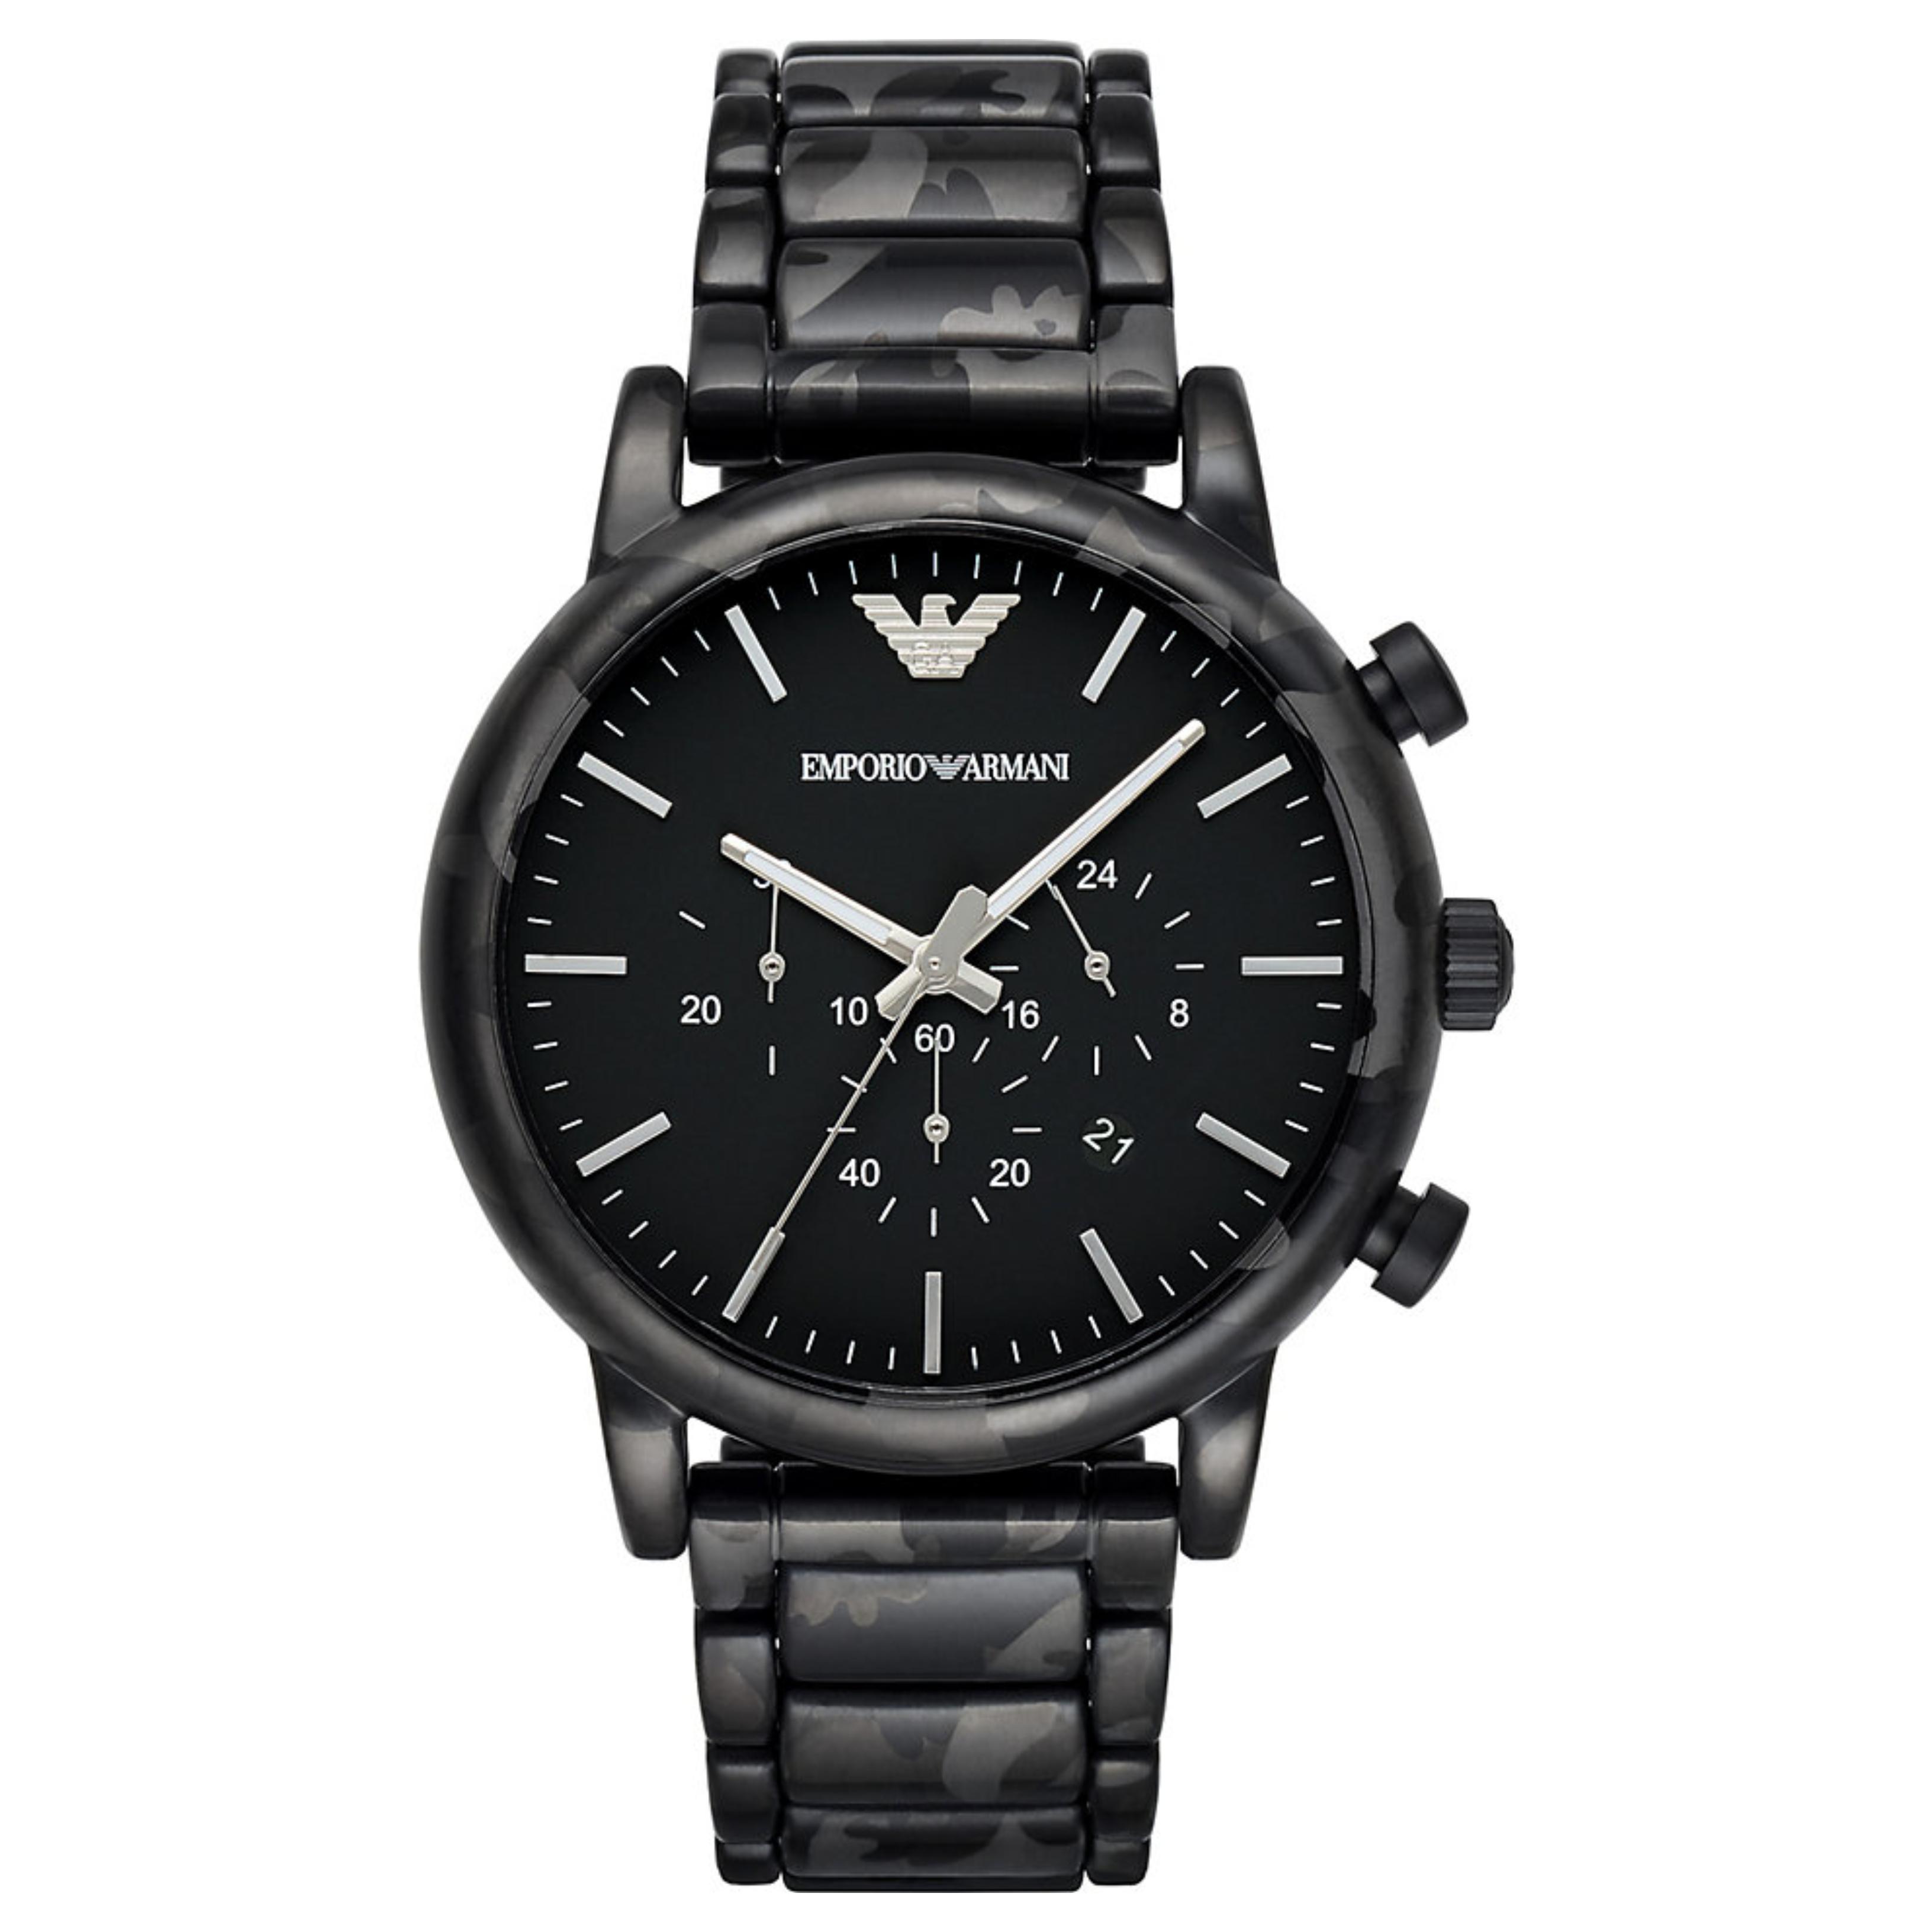 Emporio Armani Luigi Men's Watch AR11045 | Chronograph Matte Black Dial | Bracelet Strap